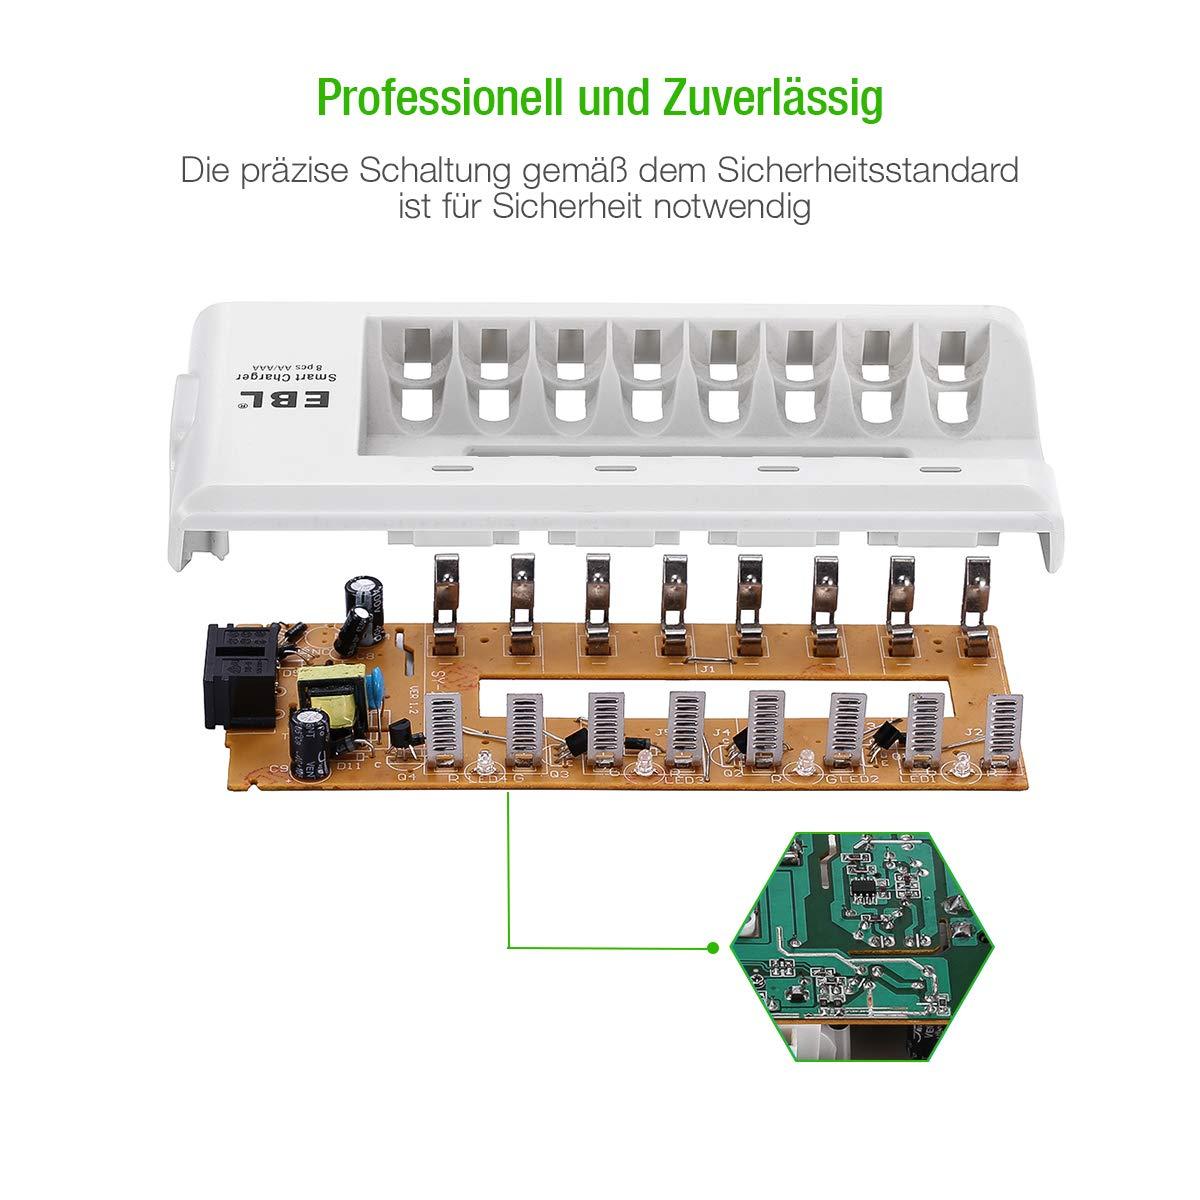 EBL Intelligentes Akku Ladegerät 8 Stecker AA AAA Charger für NI-MH NI-CD Mignon AA Micro AAA Wiederaufladbar Batterie